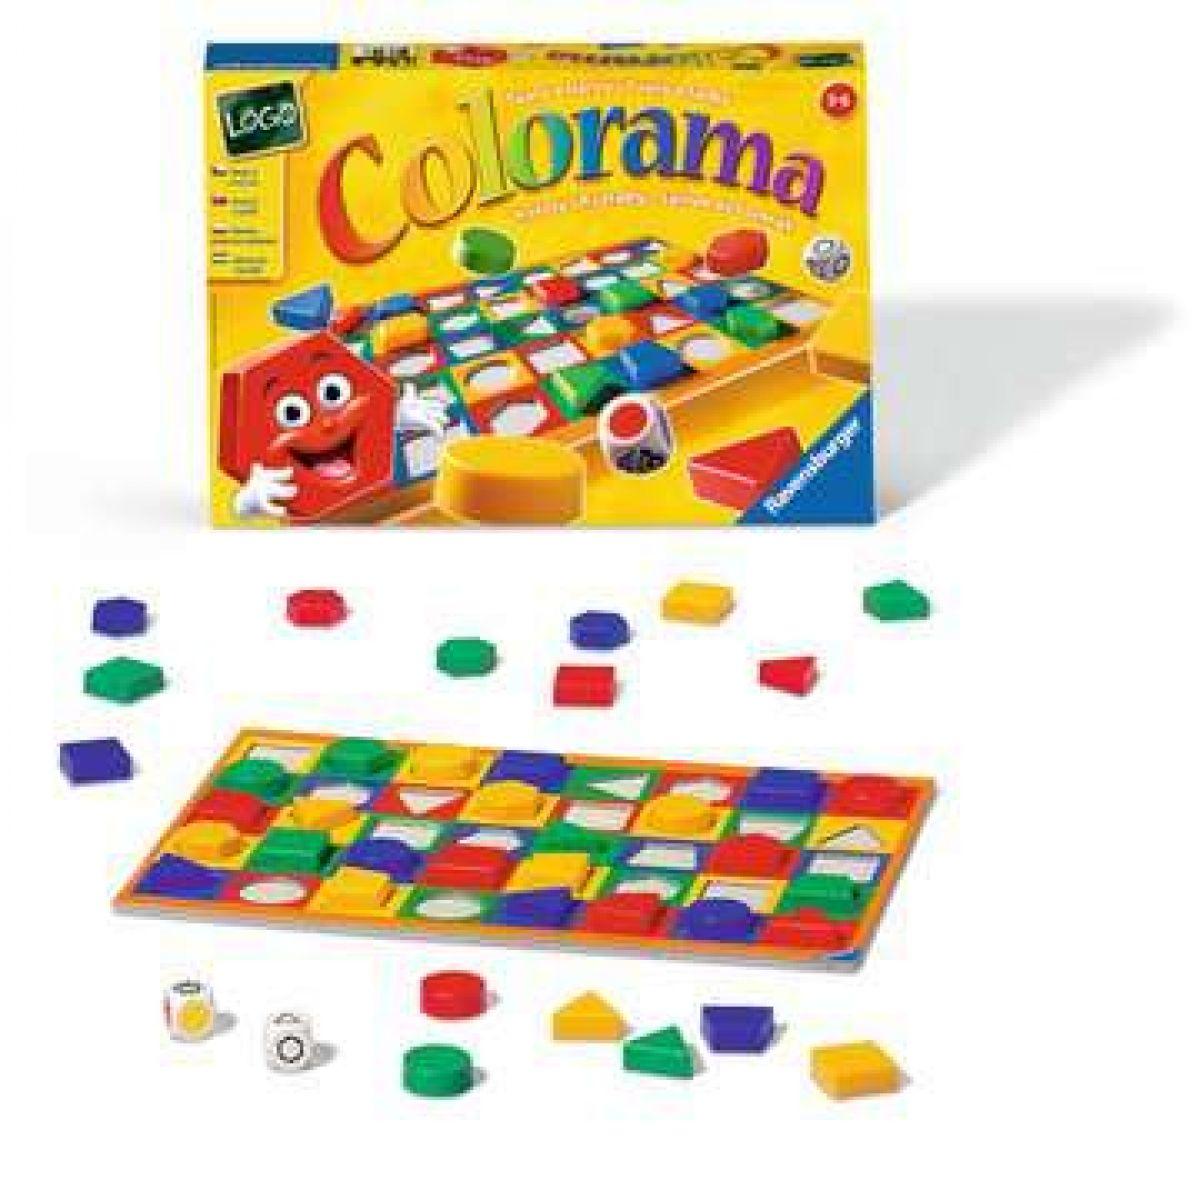 Ravensburger Colorama edukativní hra